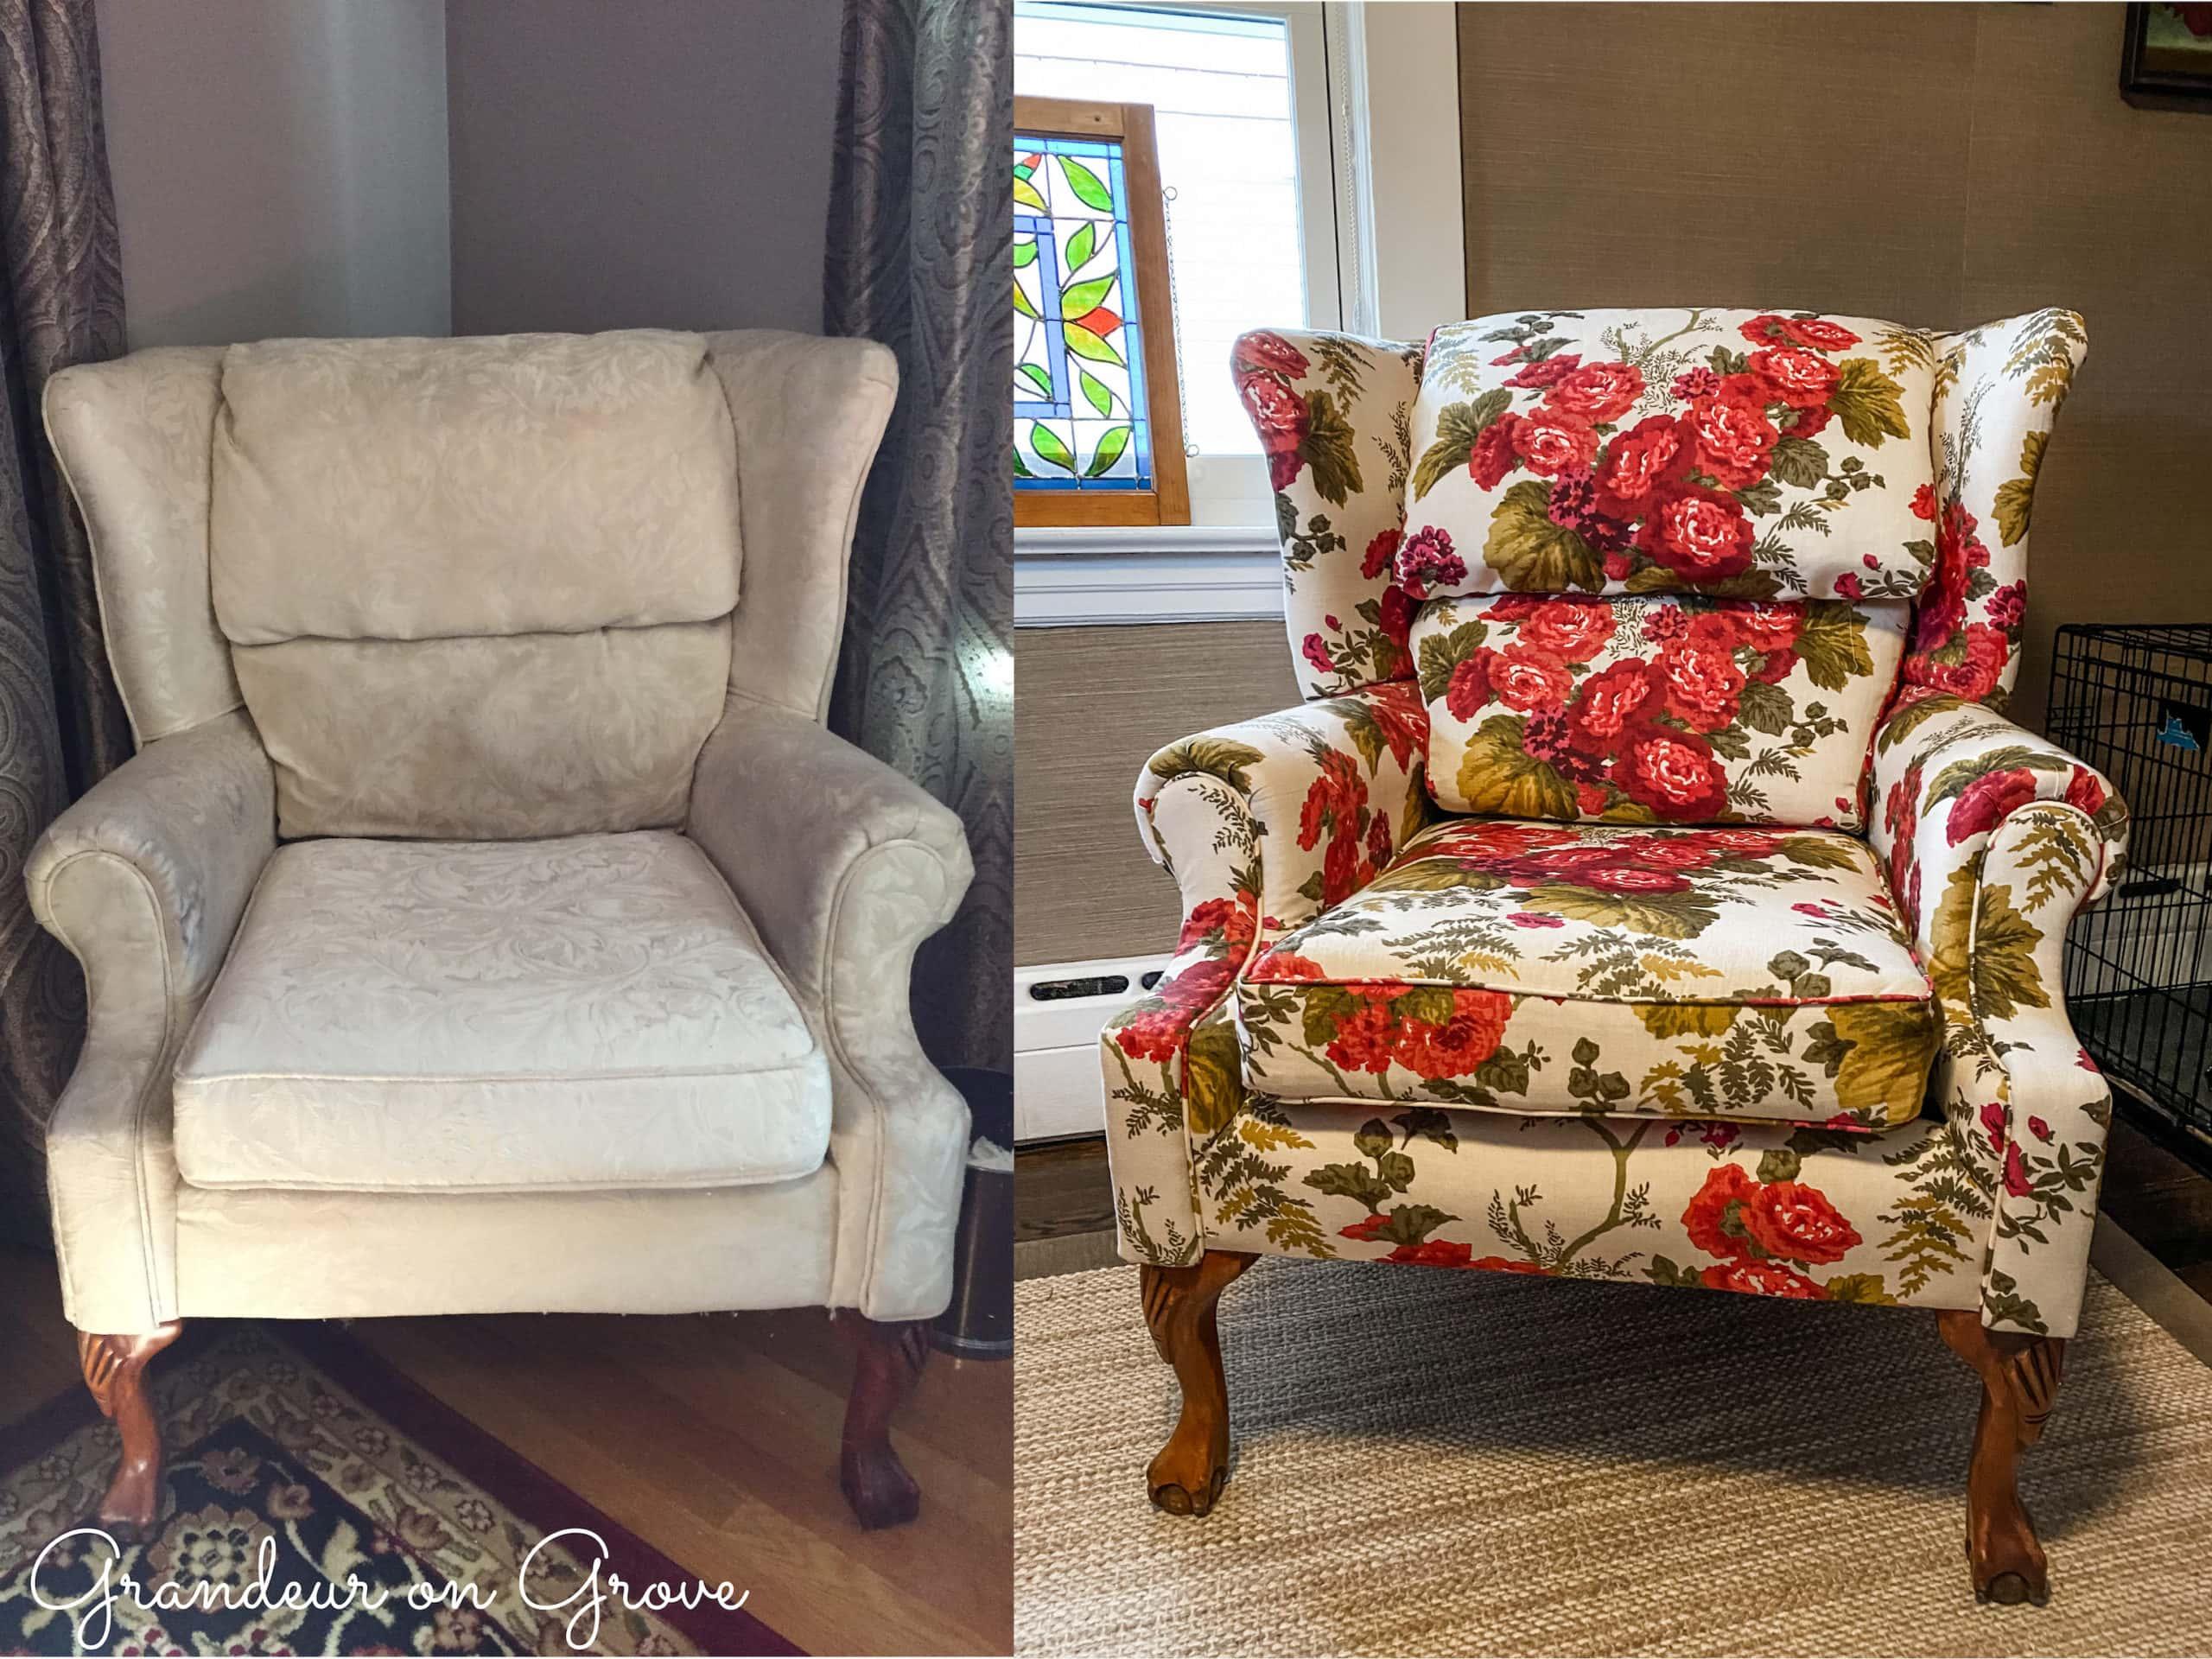 Before & After: Furniture Reupholstery – Grandeur on Grove